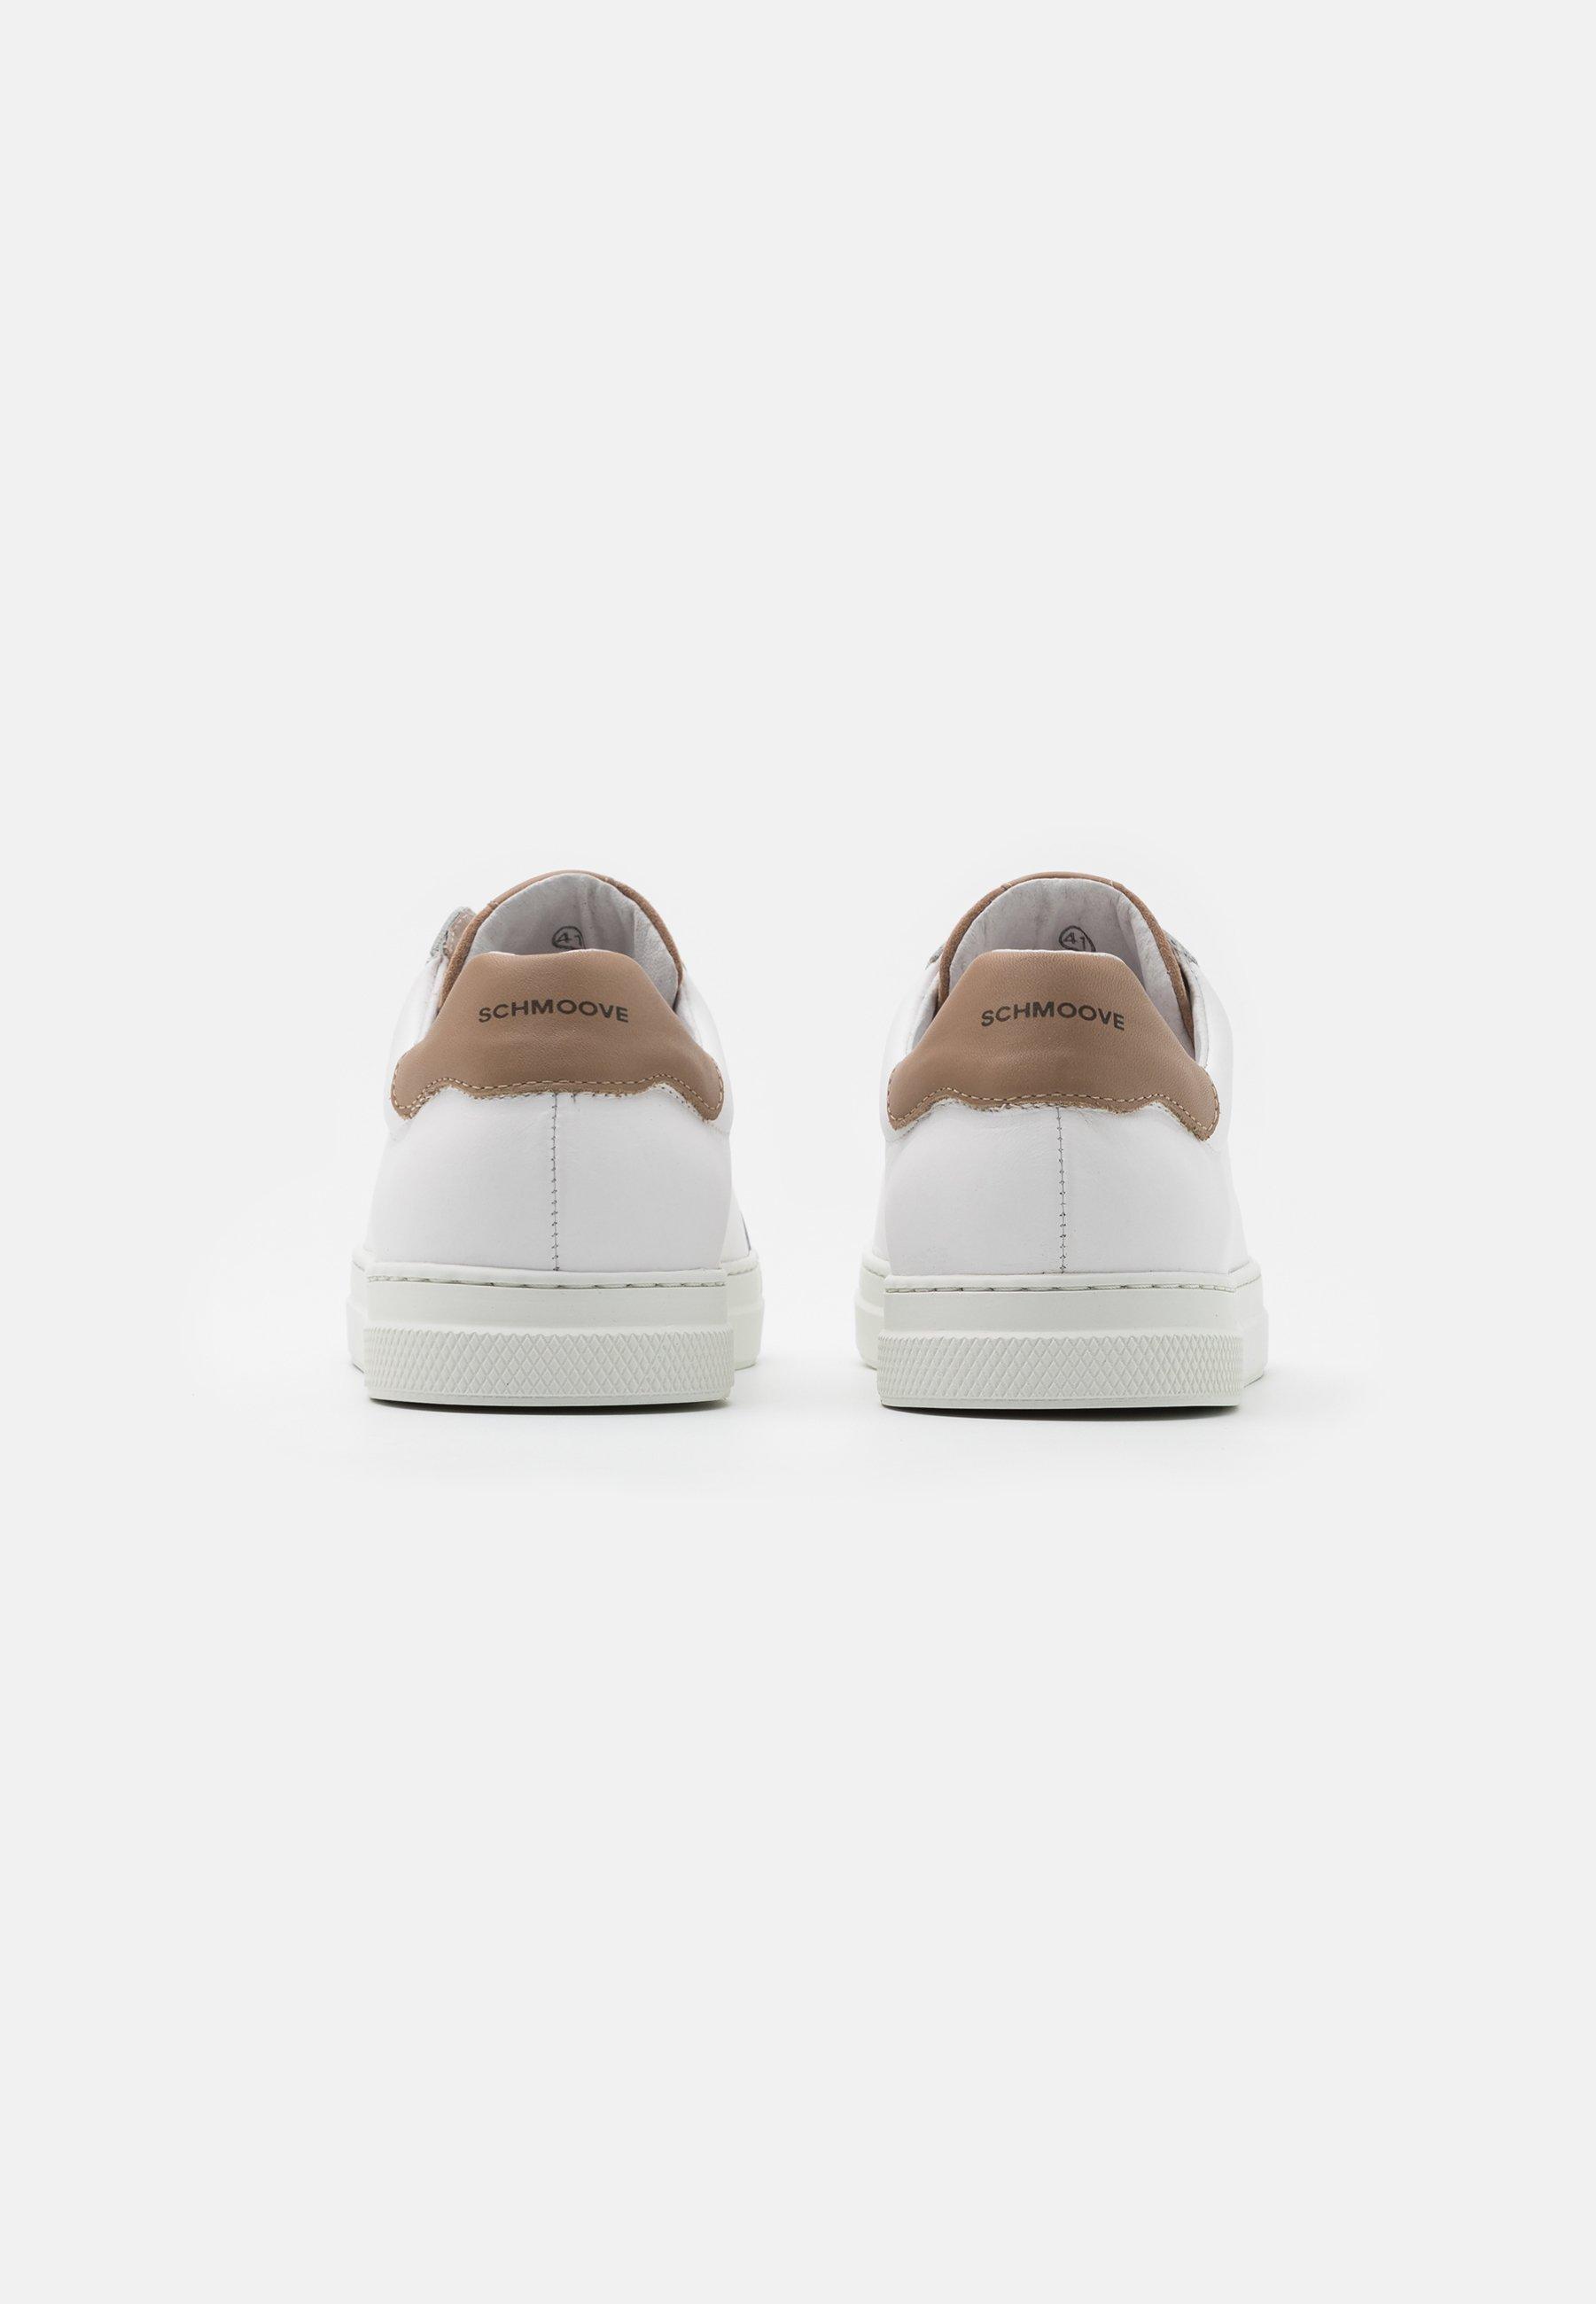 Schmoove SPARK CLAY - Sneaker low - white/beige/weiß - Herrenschuhe ZgoJU